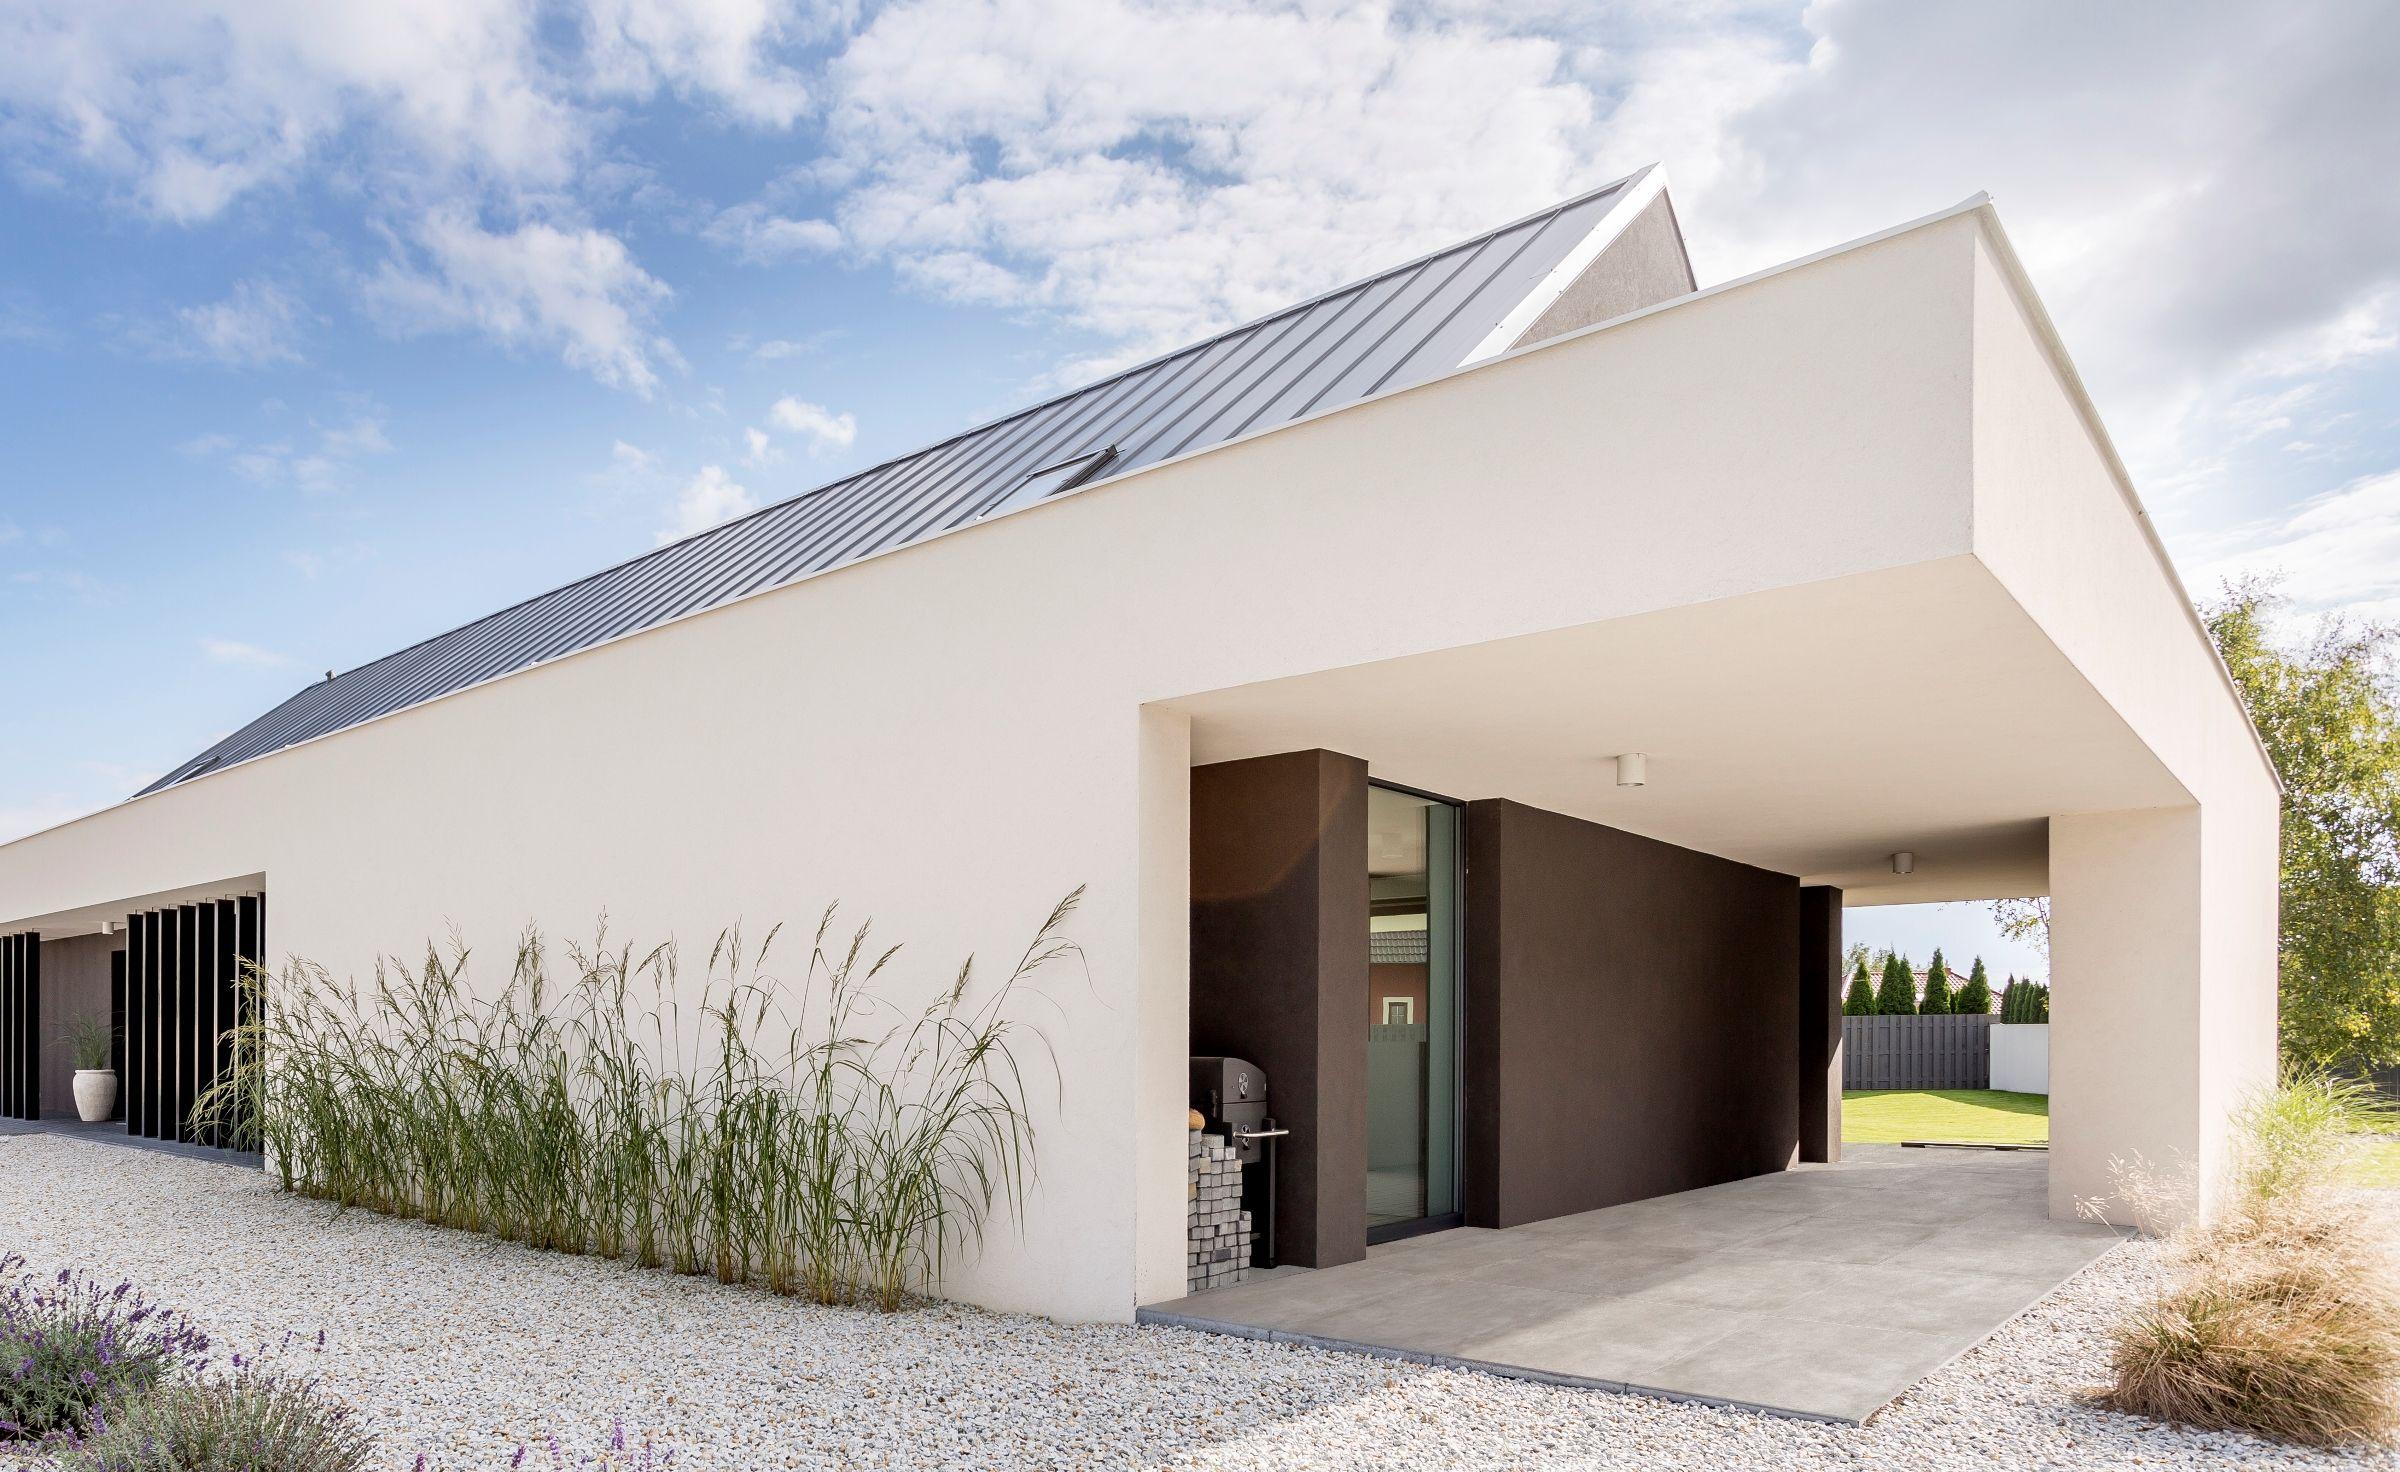 Garten Anlegen Neubau Inspirierend Primecollection Uniplus Outdoor Smoke Terrassenplatte